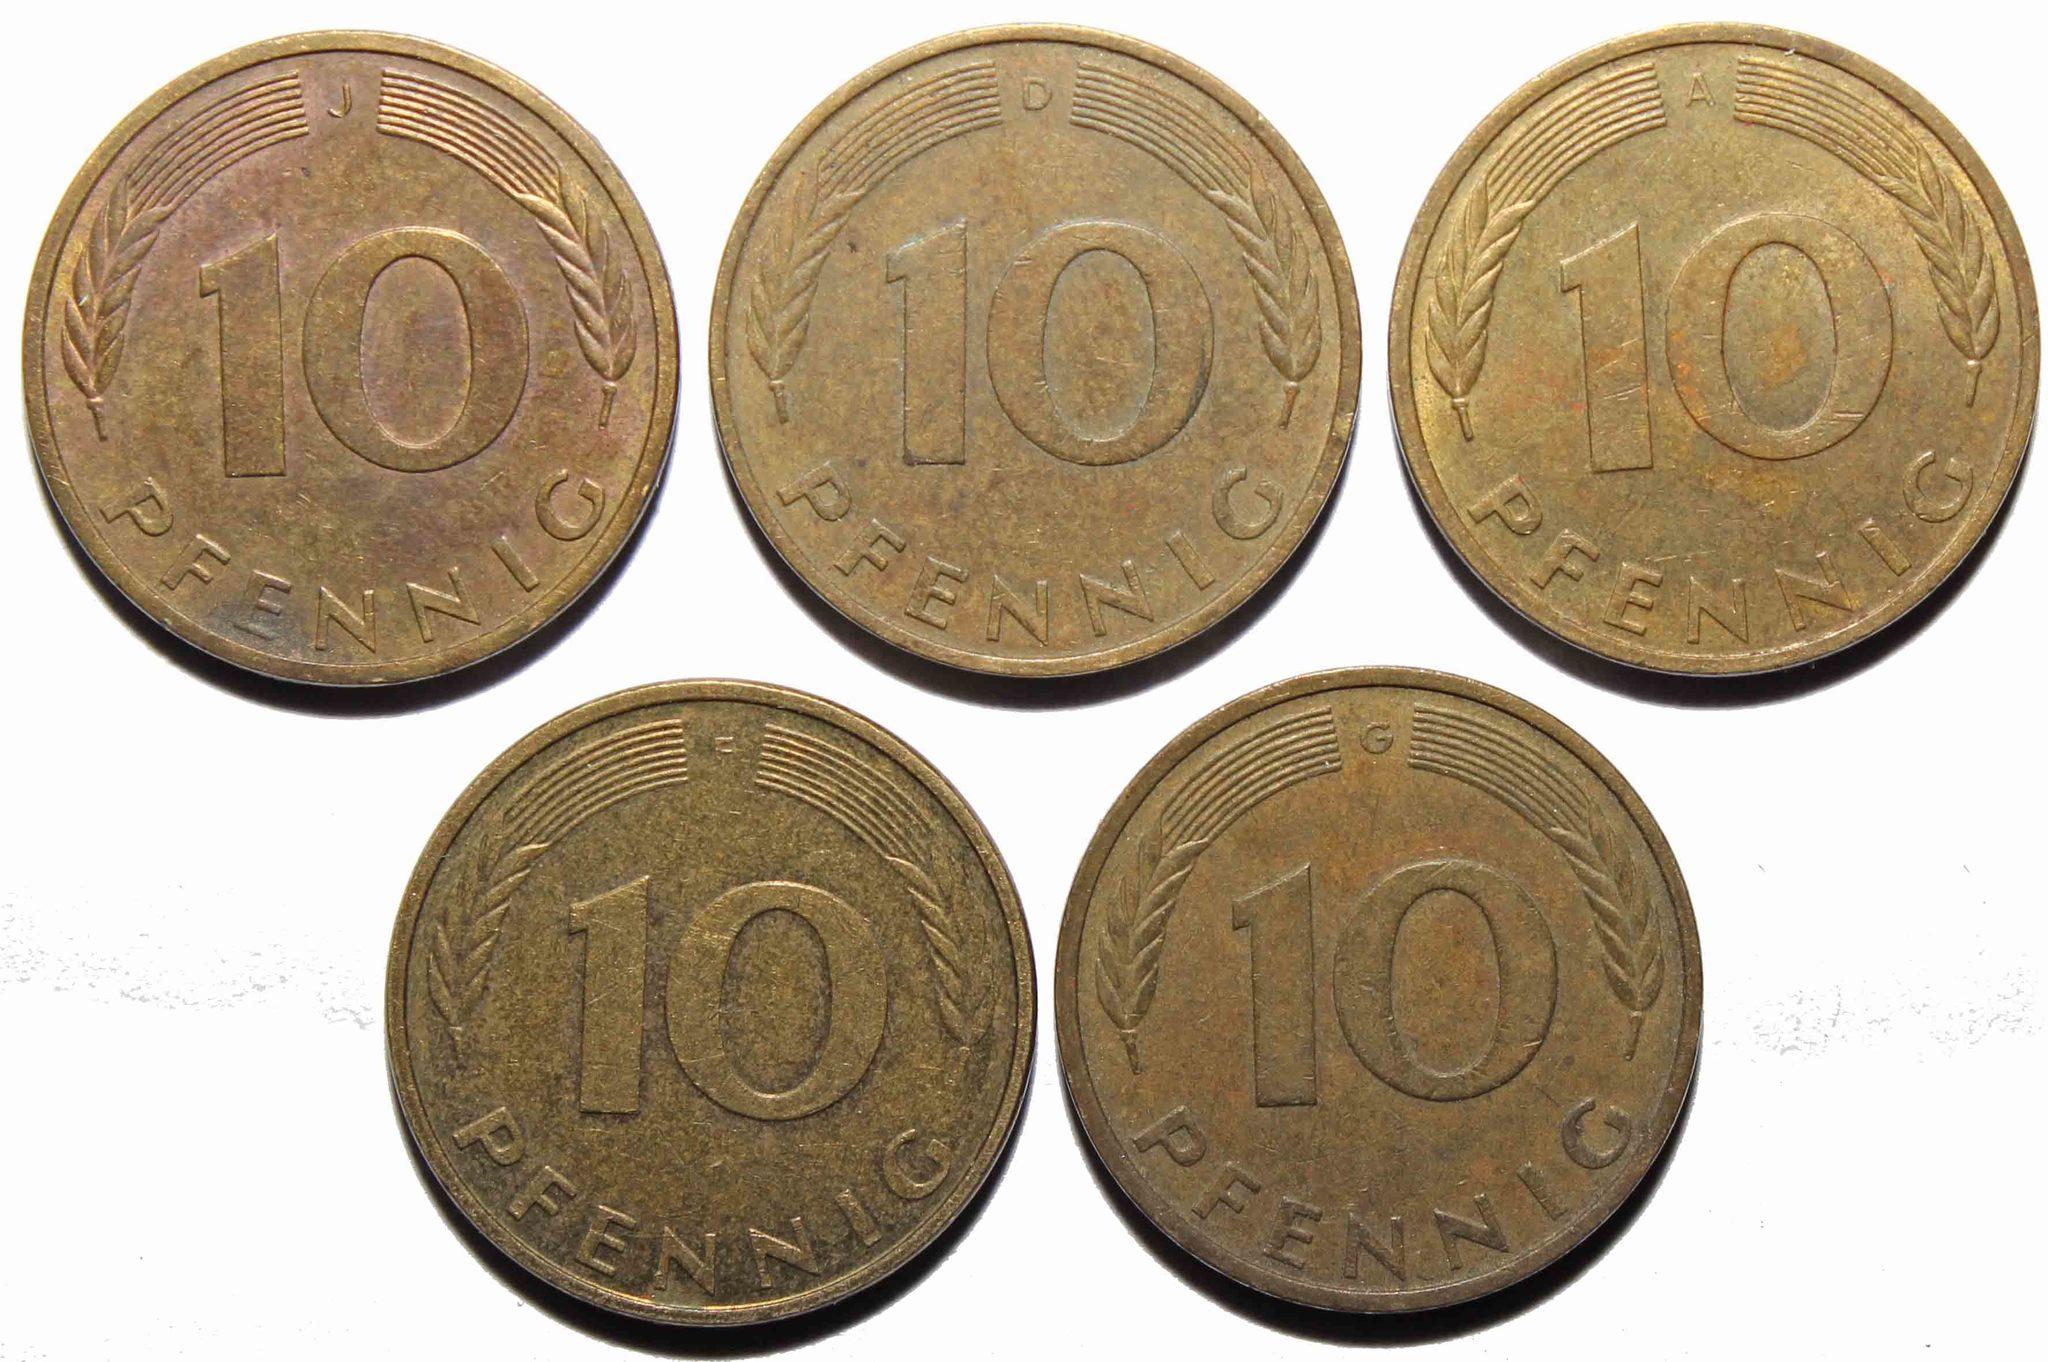 Набор из 5 монет 10 пфеннигов Германия ФРГ. VF-XF